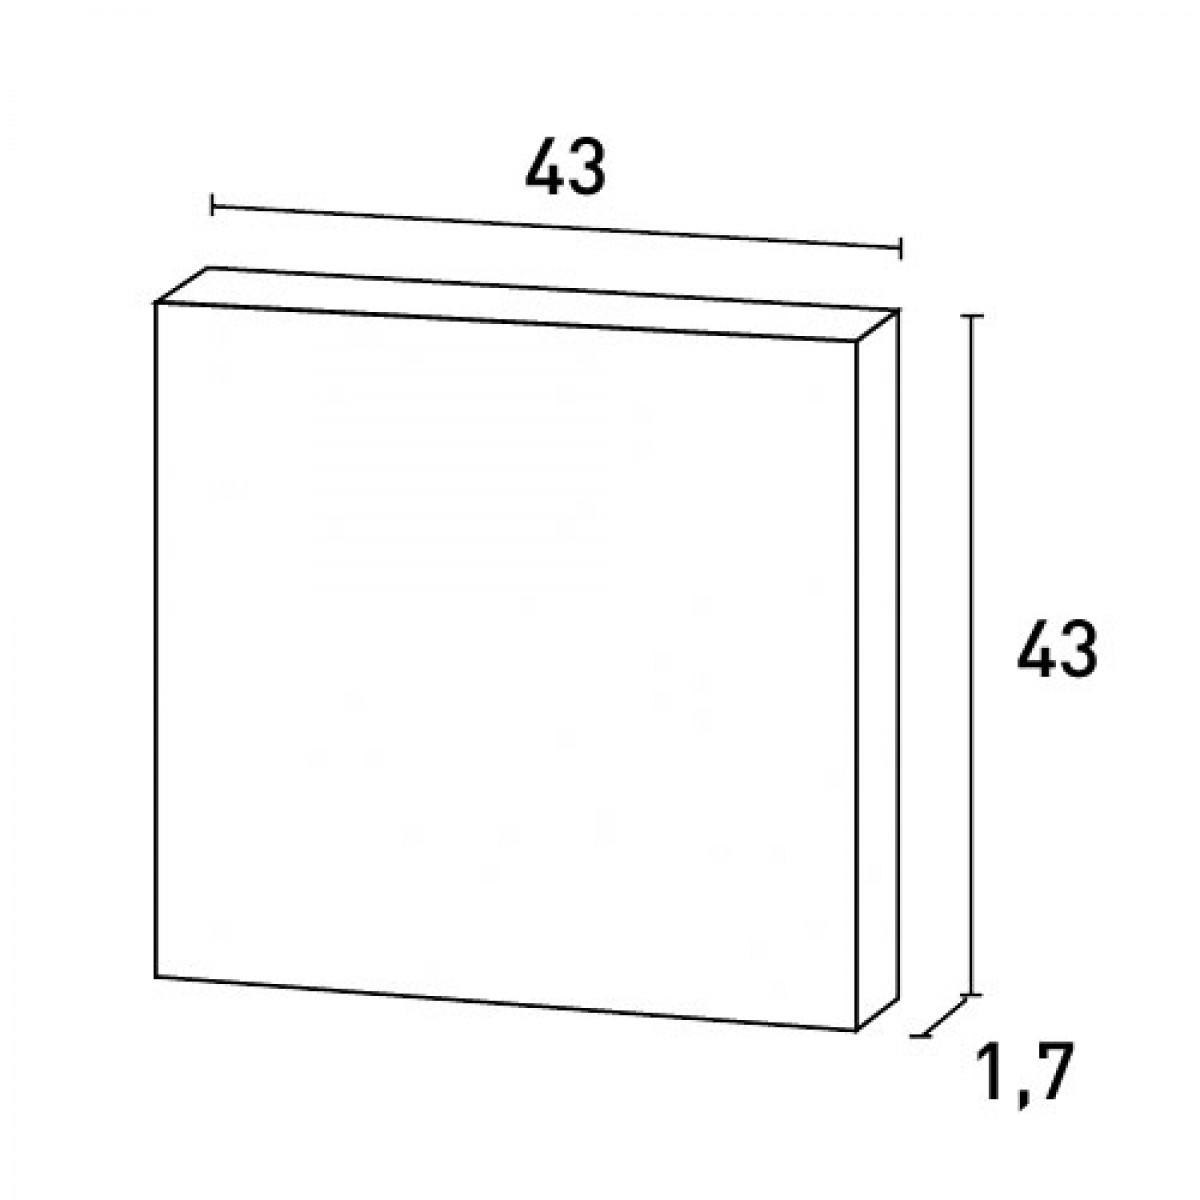 Panou Usa Luxxus D506, Dimensiuni: 43 X 43 X 1.7 cm, Orac Decor